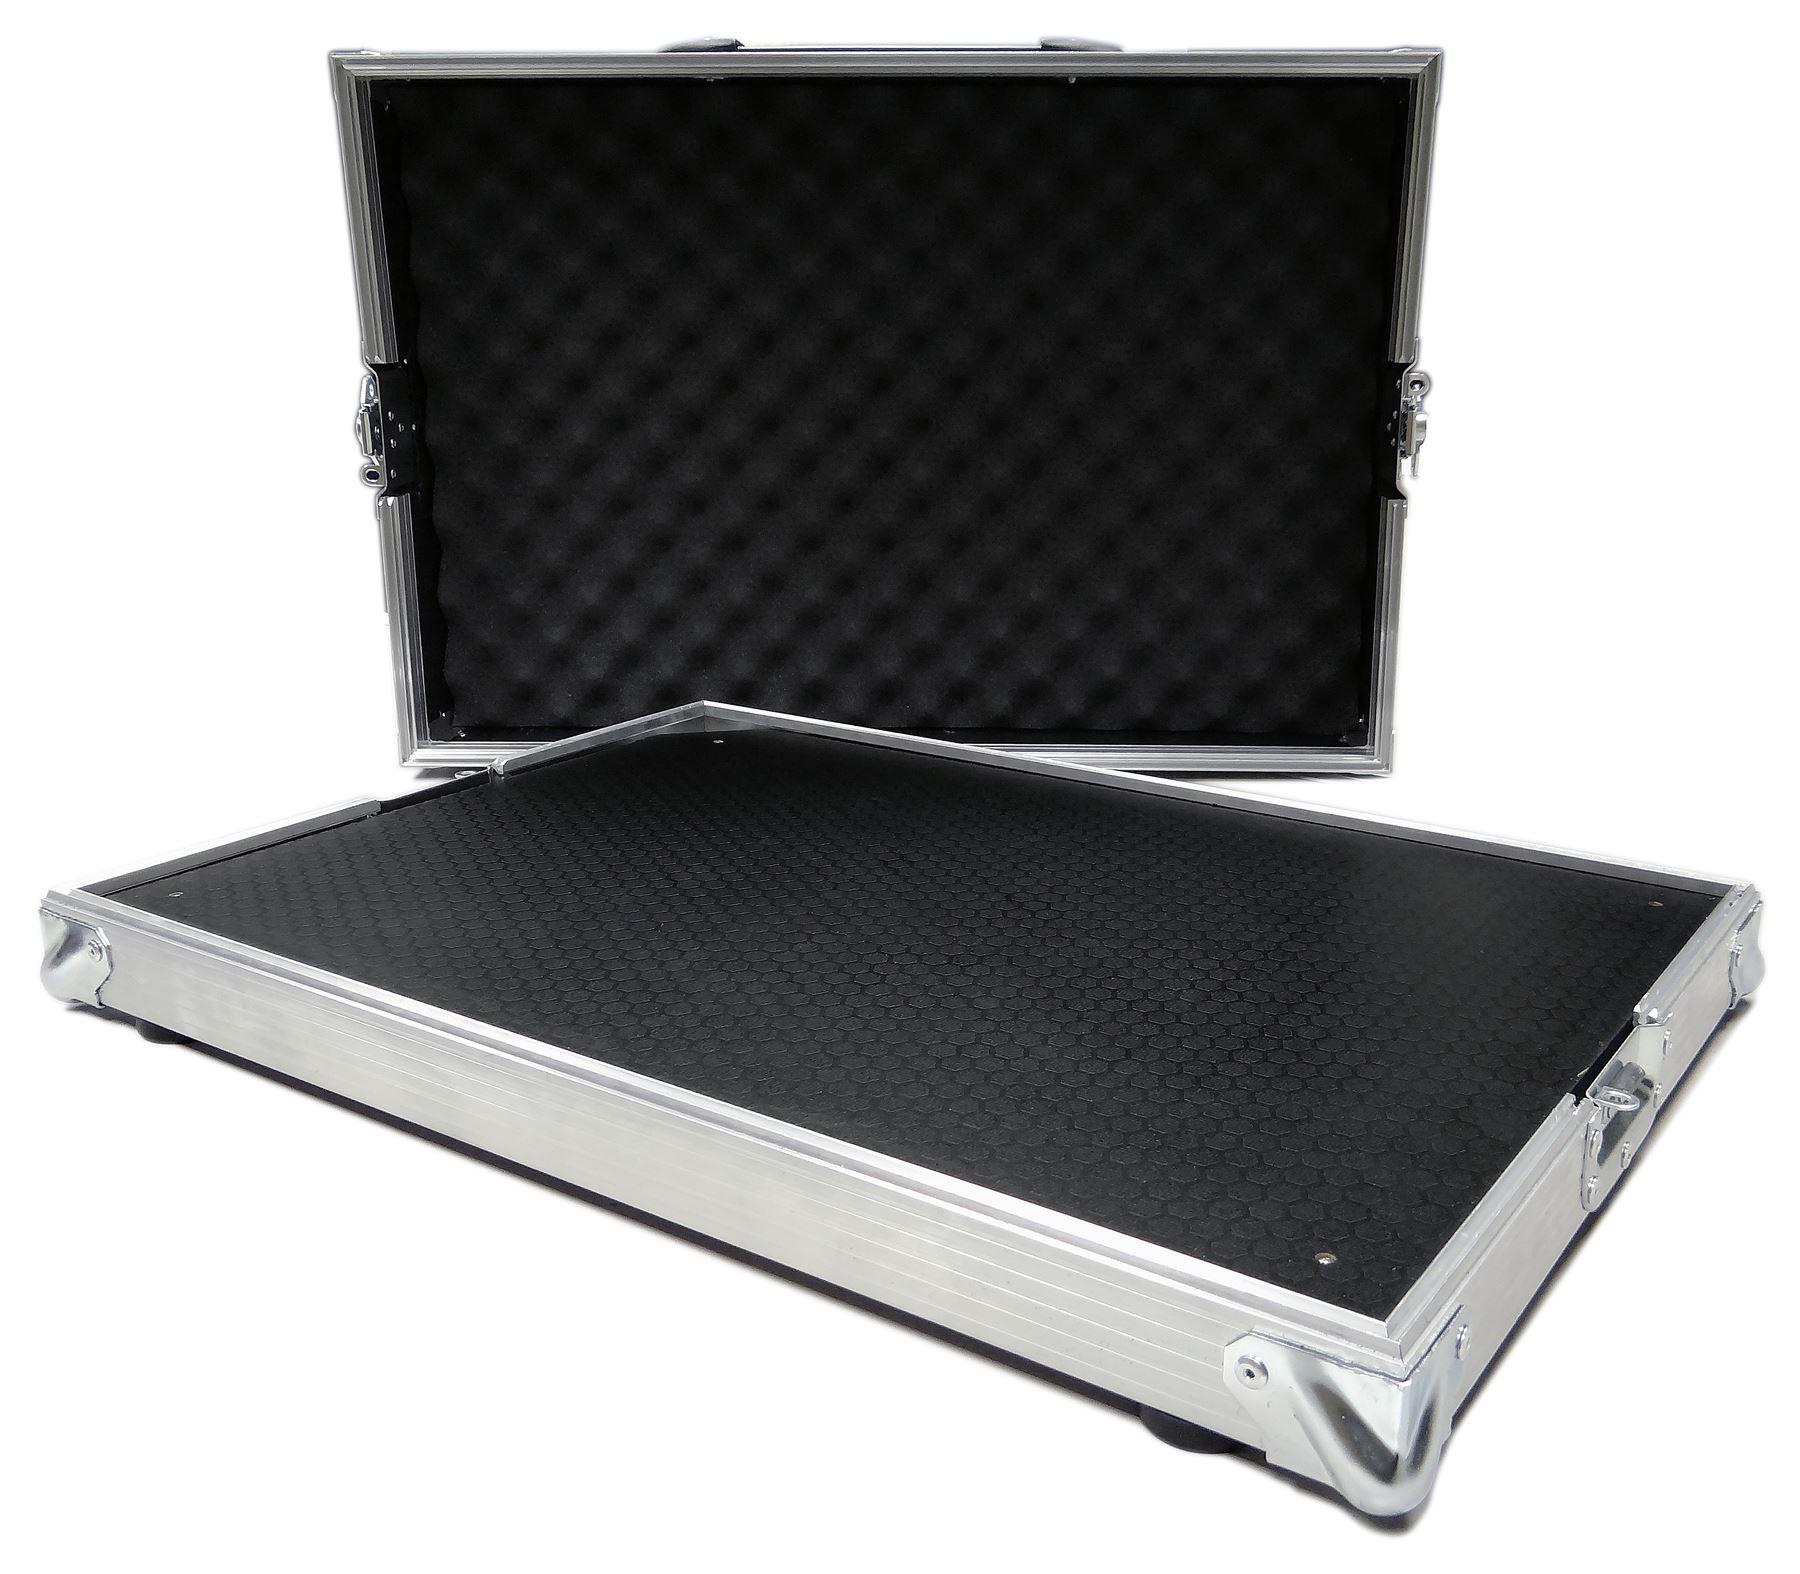 guitar effects pedalboard flight case pedal board 640x380 mm ebay. Black Bedroom Furniture Sets. Home Design Ideas